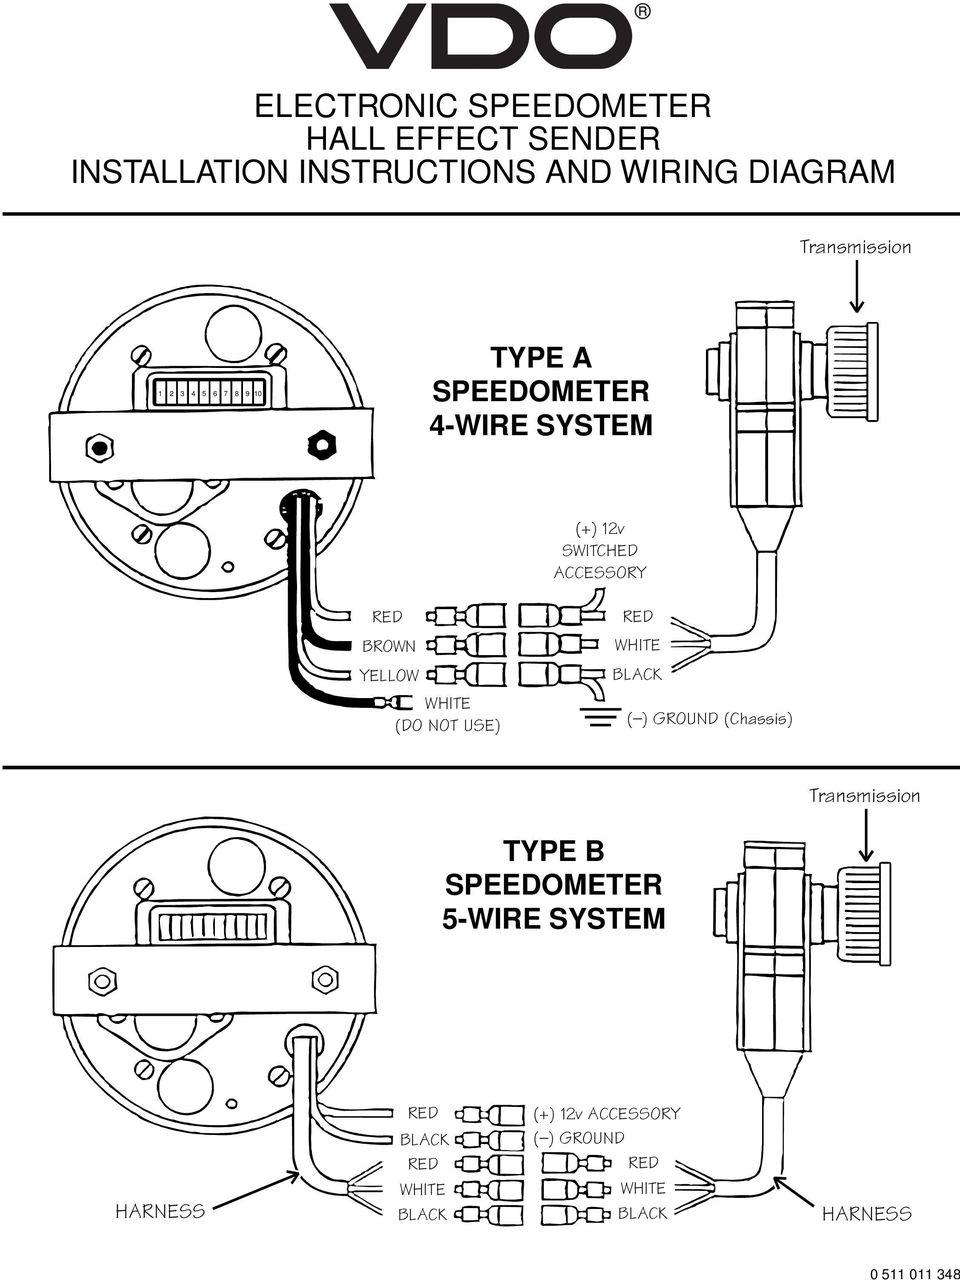 TB_9887] Vdo Tachometer Wiring Instructions Page 1 Page 2 Schematic WiringTixat Bupi Hyedi Stre Sieg Hendil Mohammedshrine Librar Wiring 101